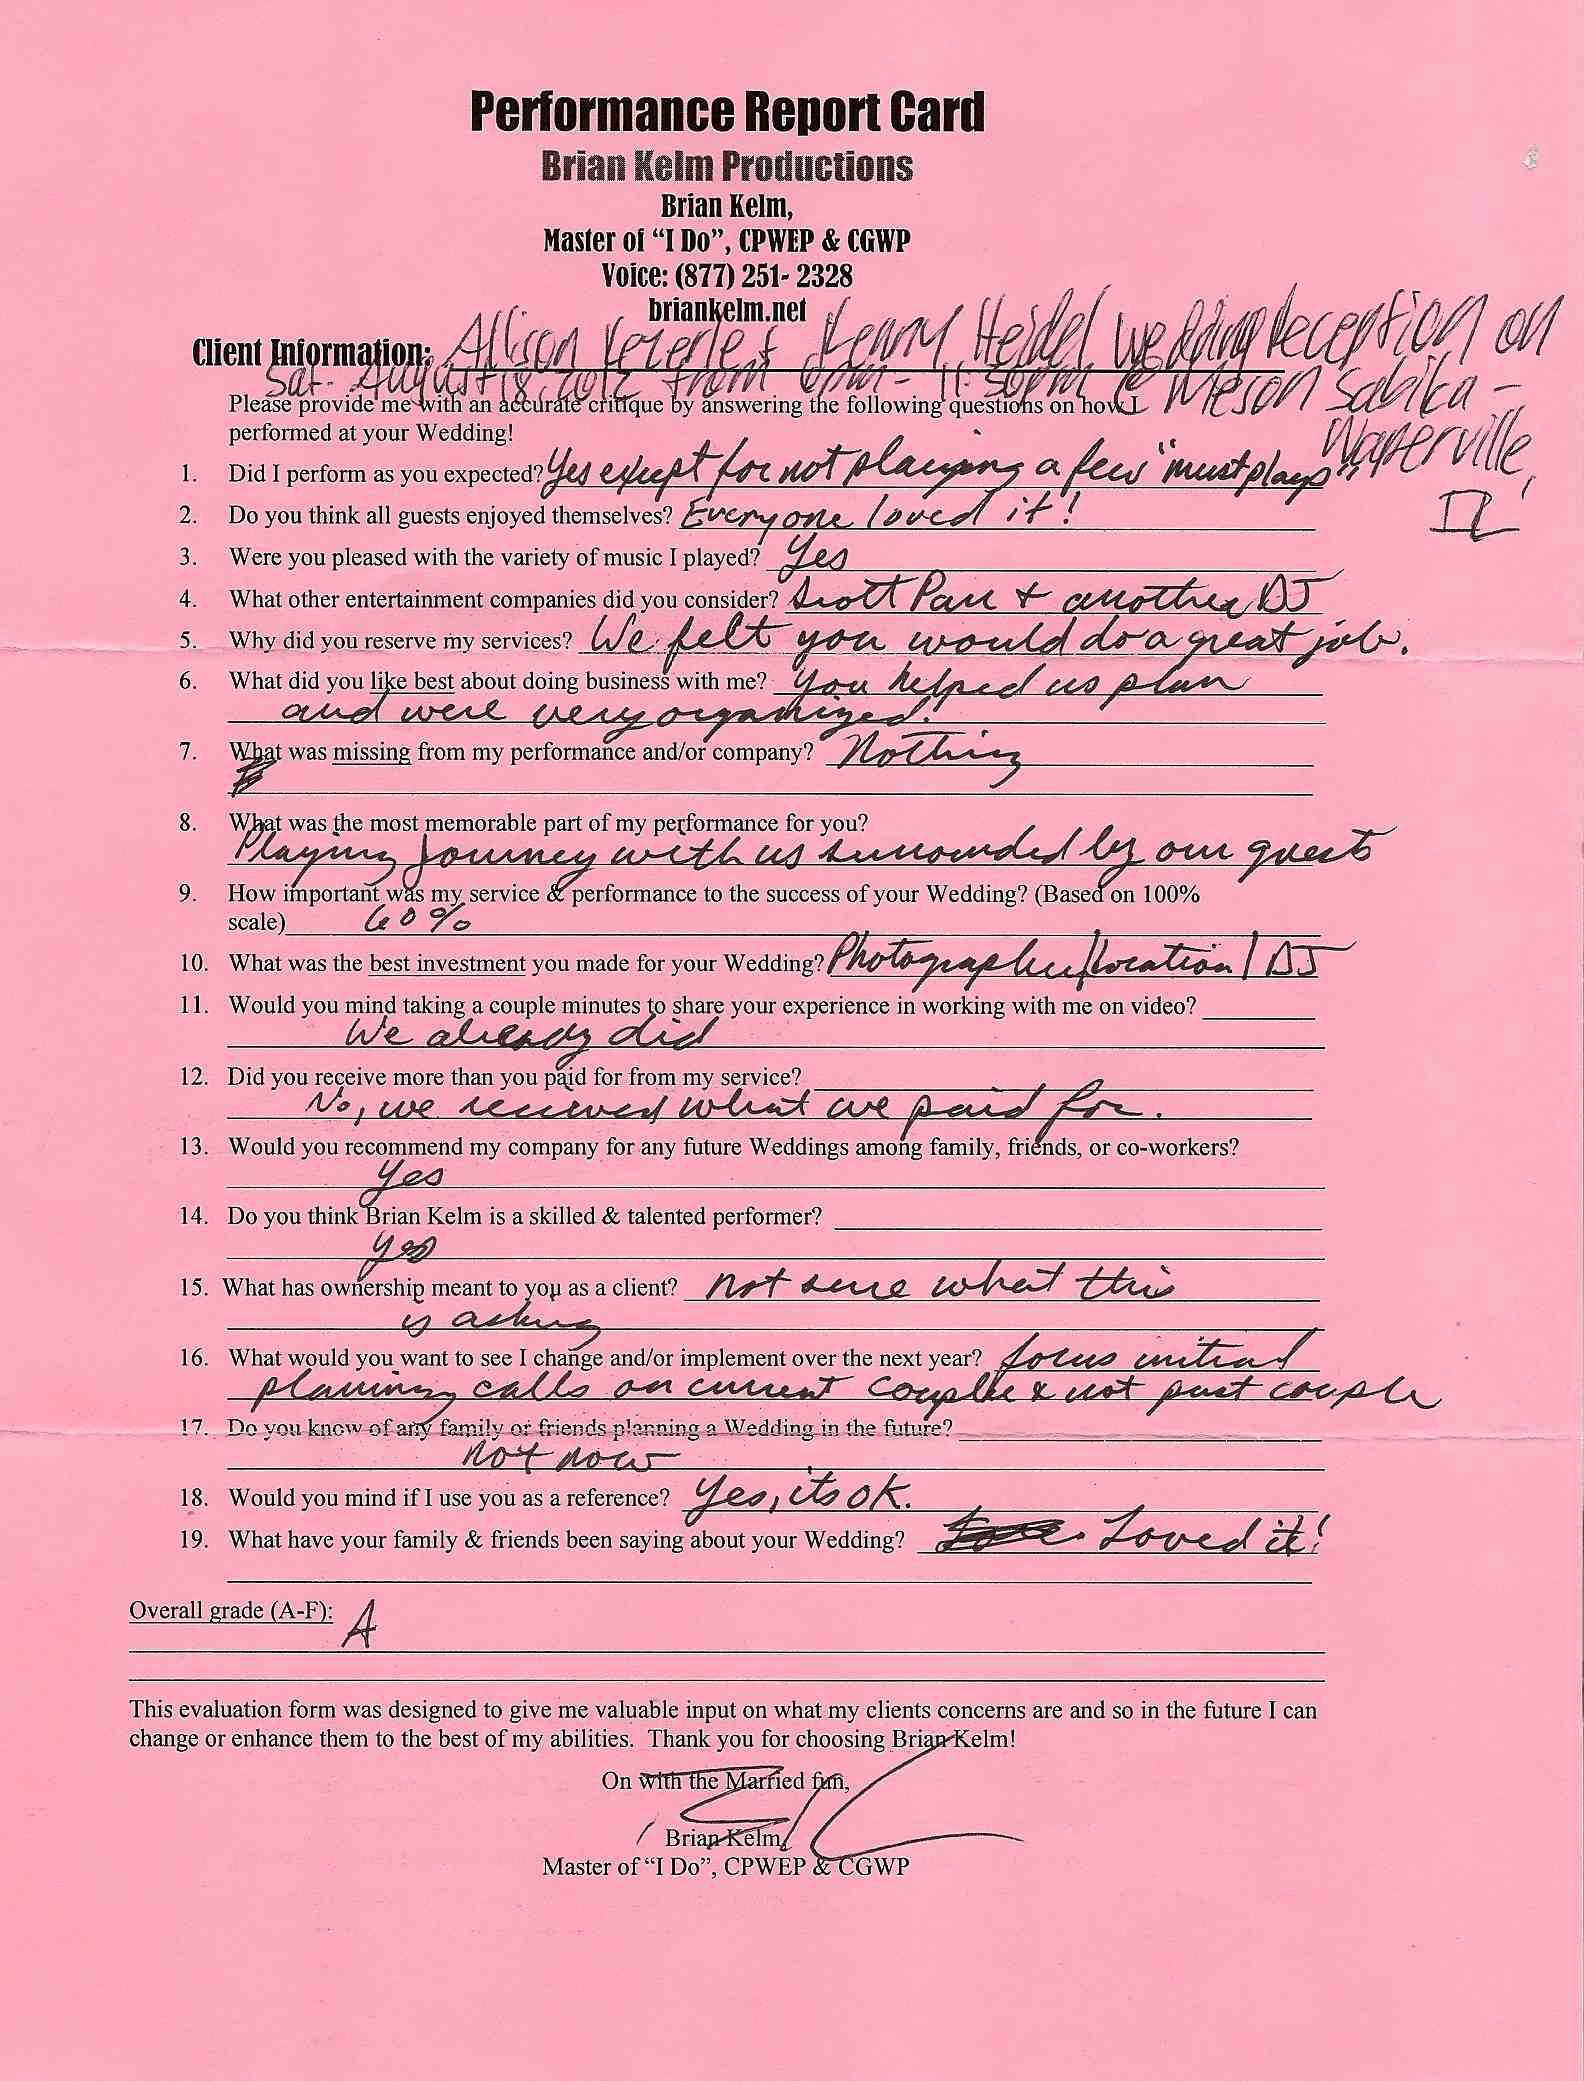 Brian Kelm - Master of Ceremonies, Performer, Wedding DJ, Creative Wedding Planner & Custom Wedding Designer, Written Testimonials, Report Card